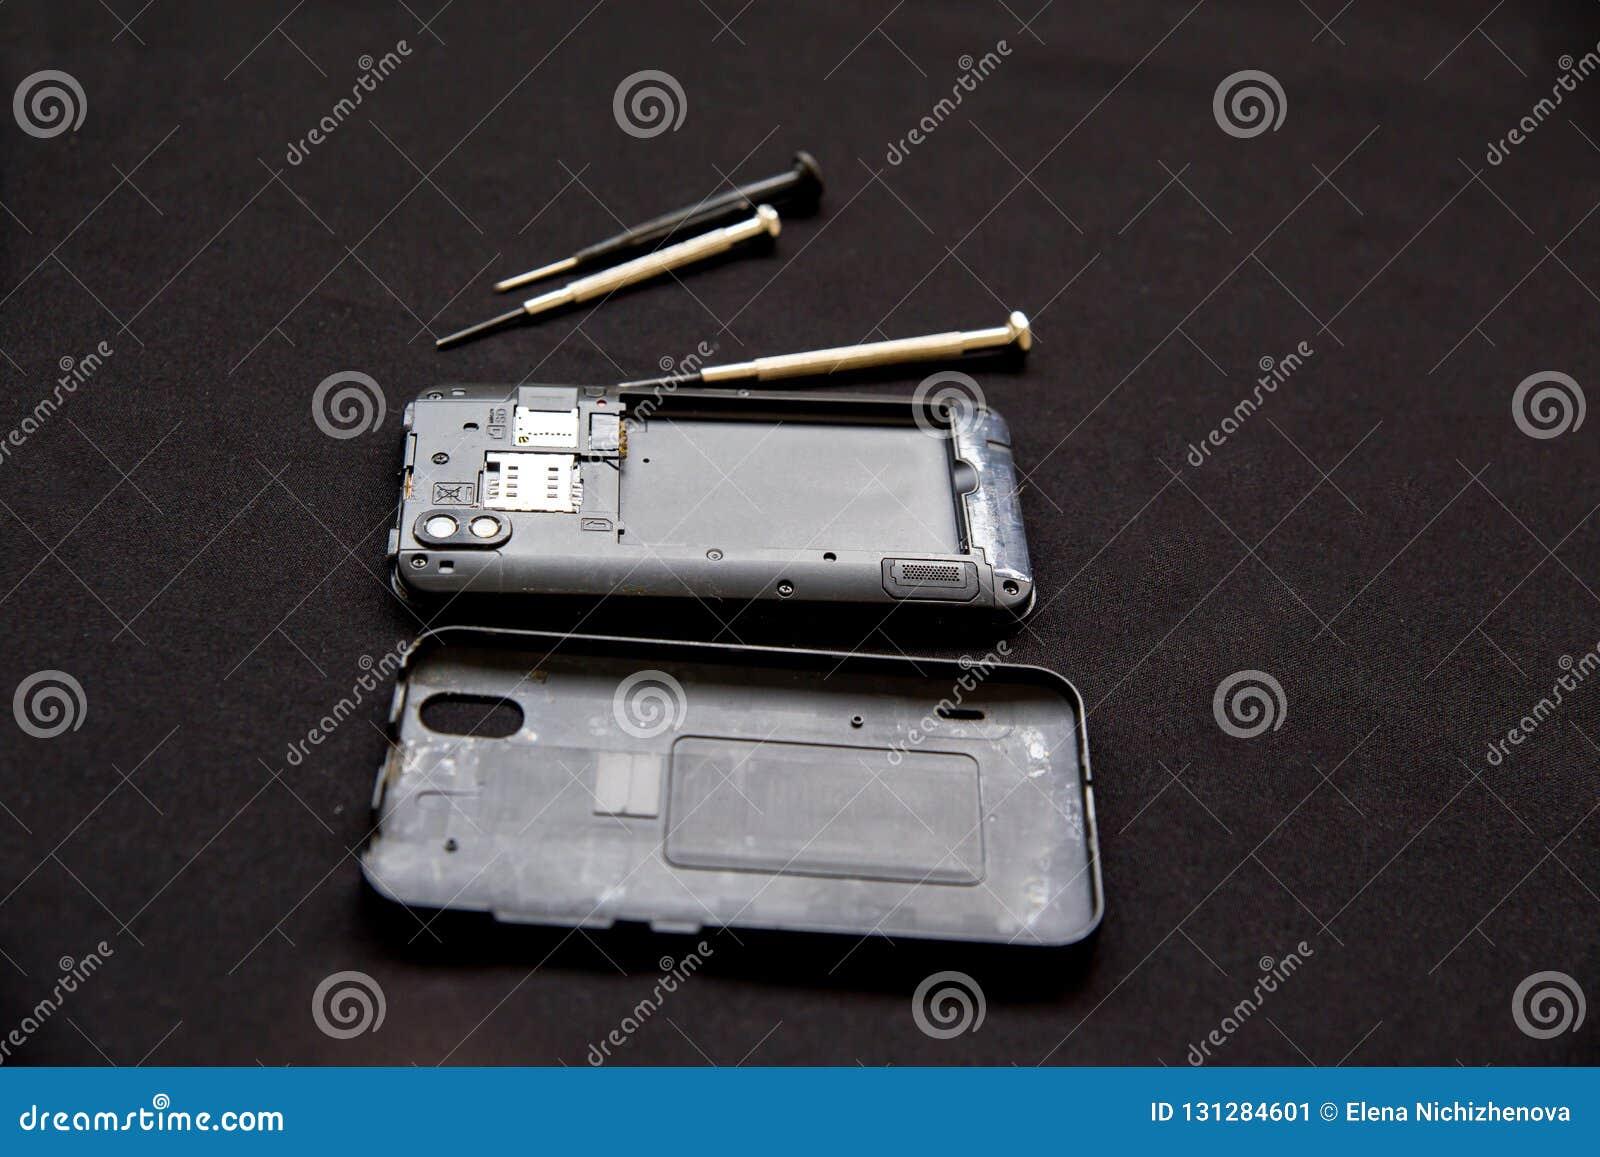 Electronics repair service - technician is fixing broken cell phone